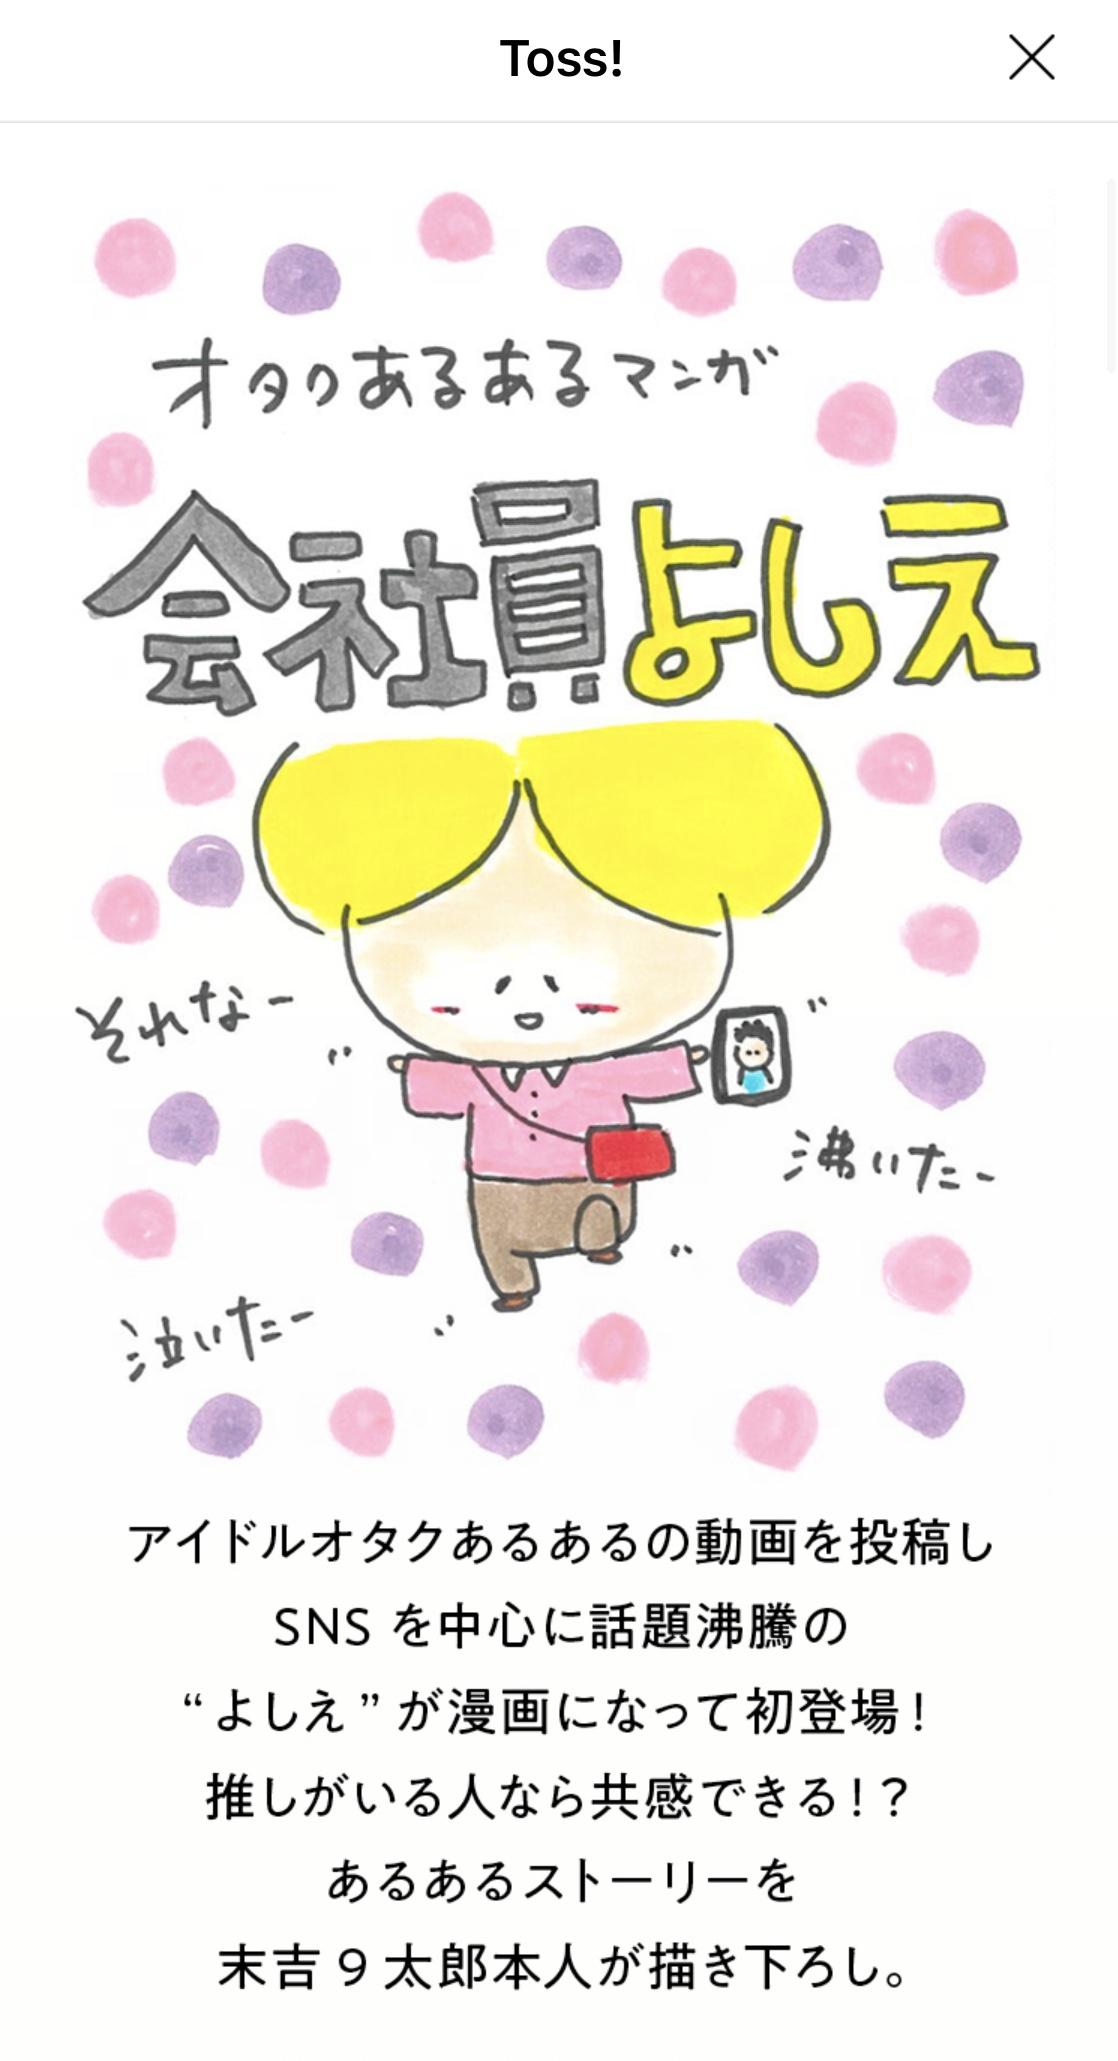 "【NEWS】末吉9太郎がLINE MOOK""Toss!""にて「よしえ主演!オタクあるある漫画」掲載♪"